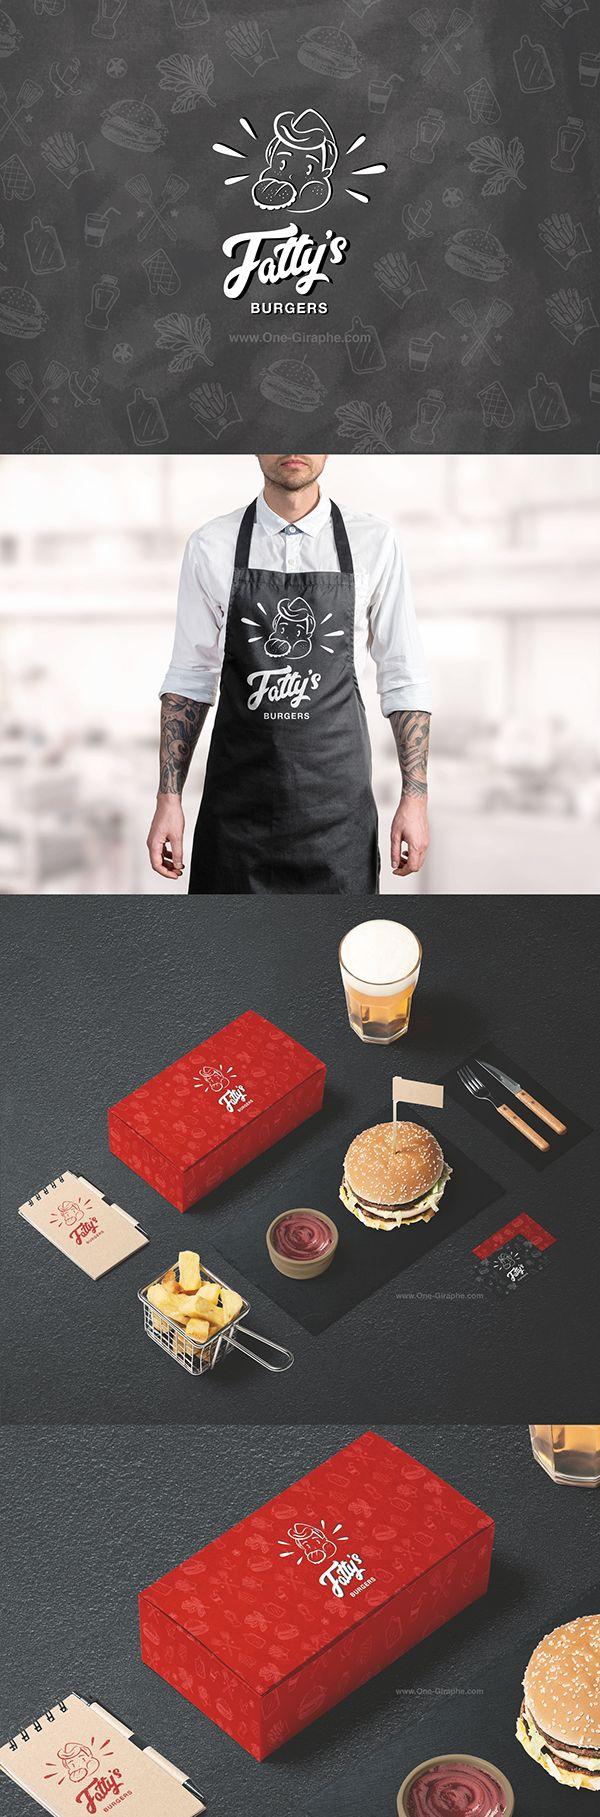 Custom Logo for sale: Fatty's Burgers: http://one-giraphe.com/prev.php?c=209  #logo #burger #customlogo #behance #logos #designer #brandidentity #fastfood #restaurant #graphic #graphicdesign